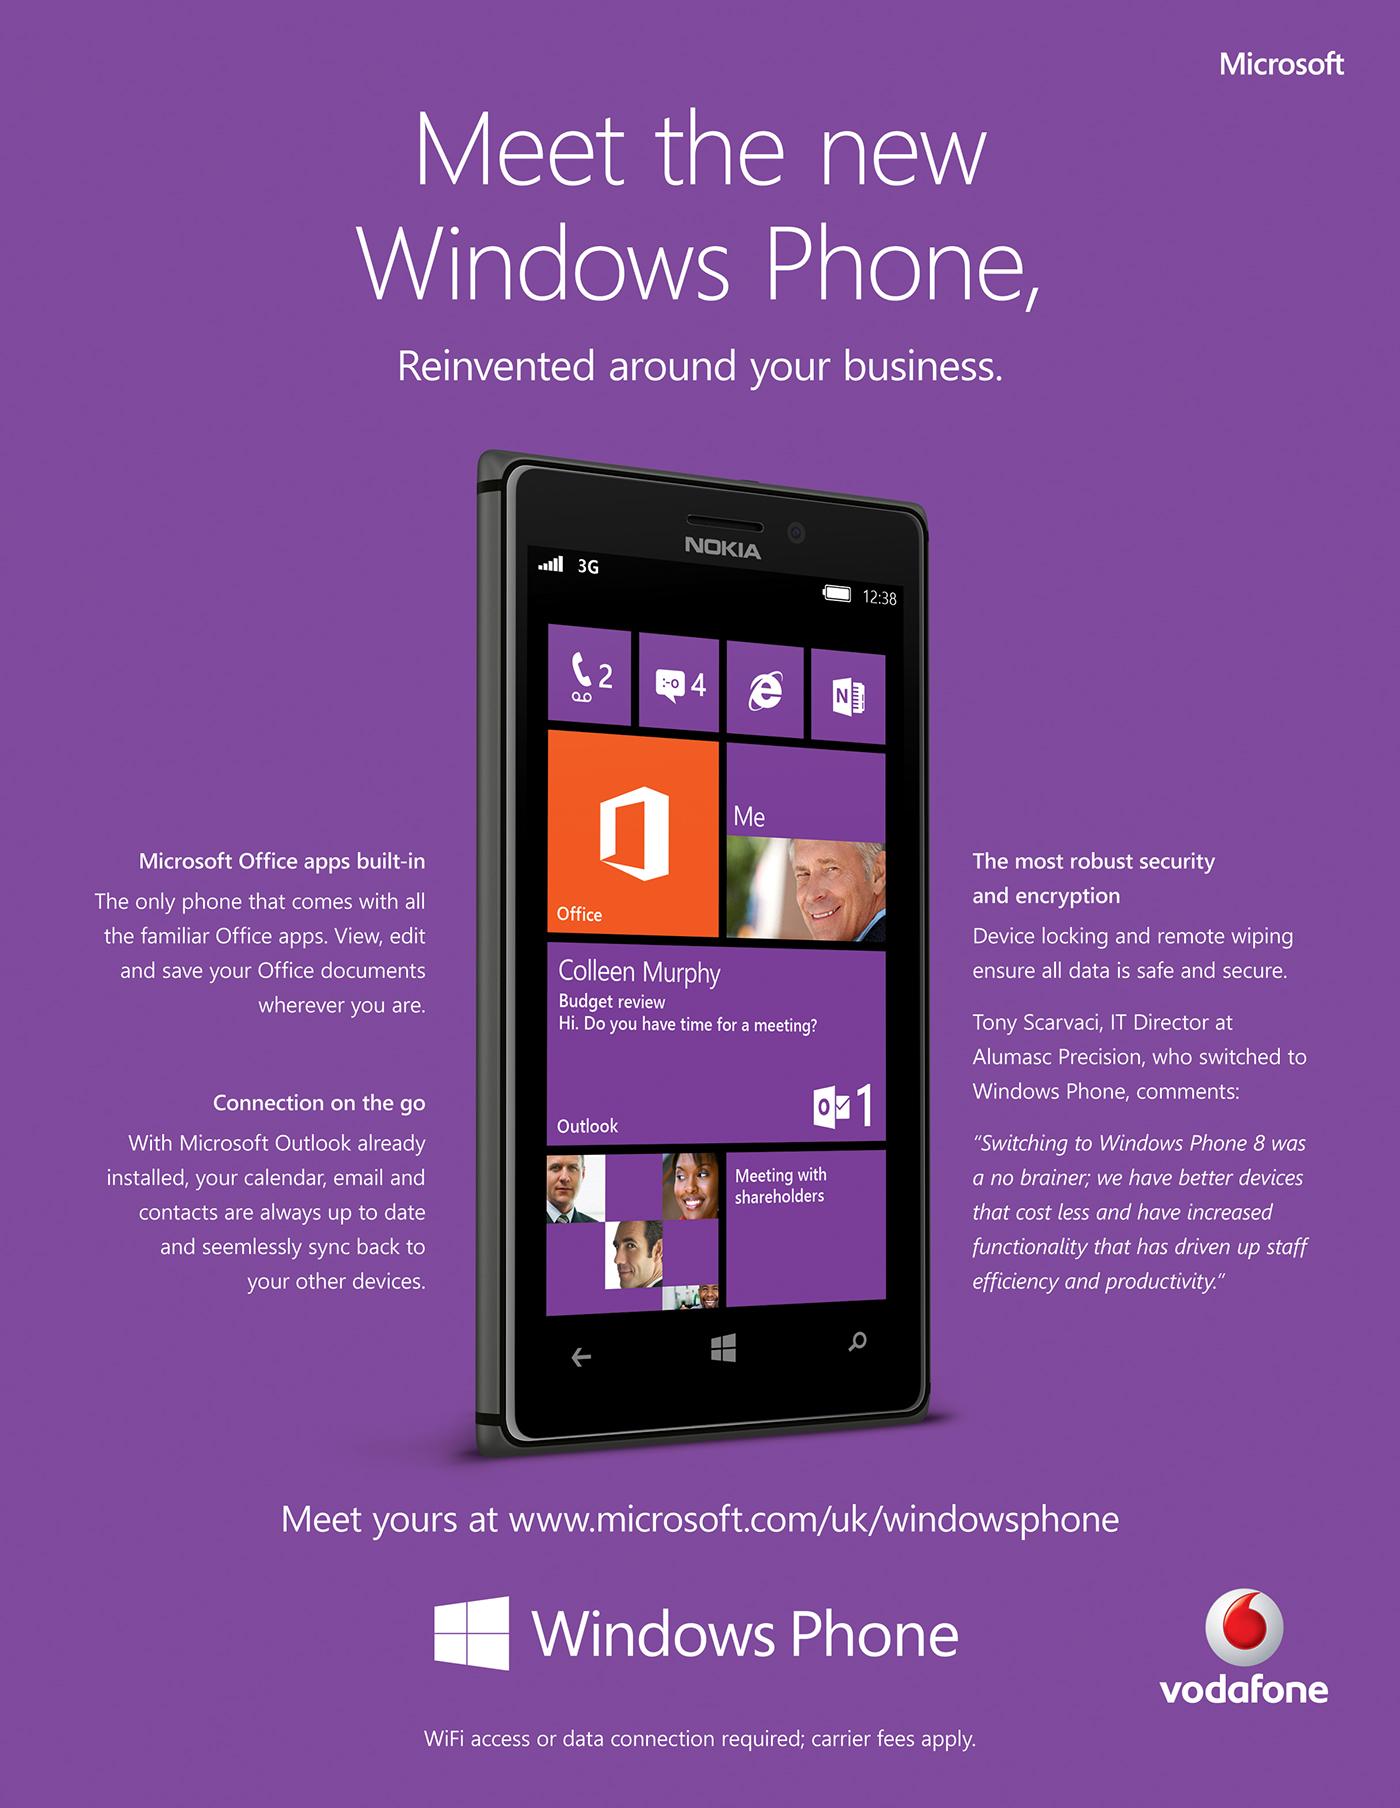 Windows Phone / Nokia925 - A4 Print Ad - LIVE WORK on Behance